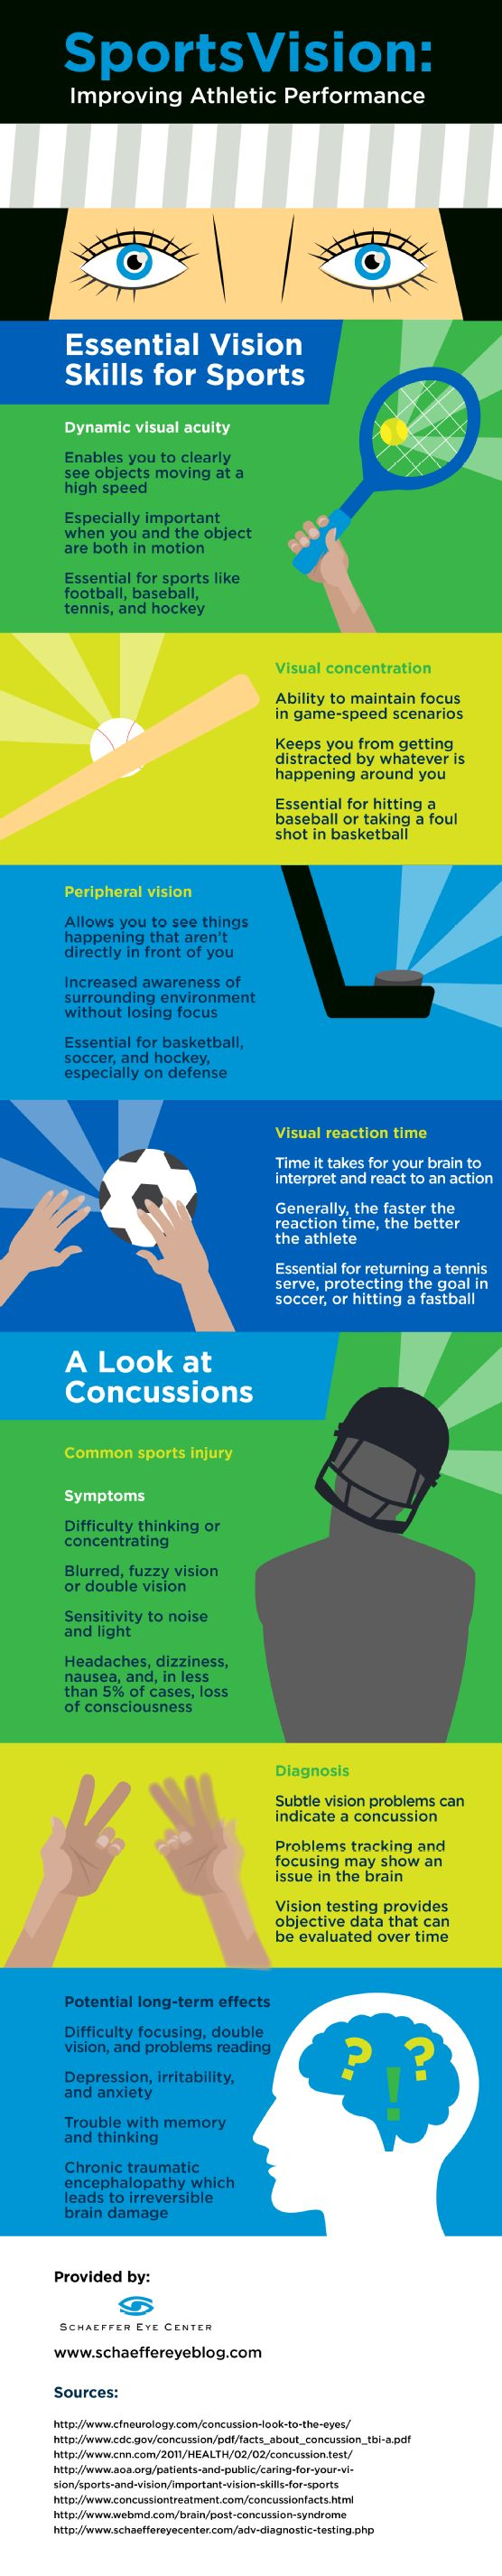 SportsVision: Improving Athletic Performance